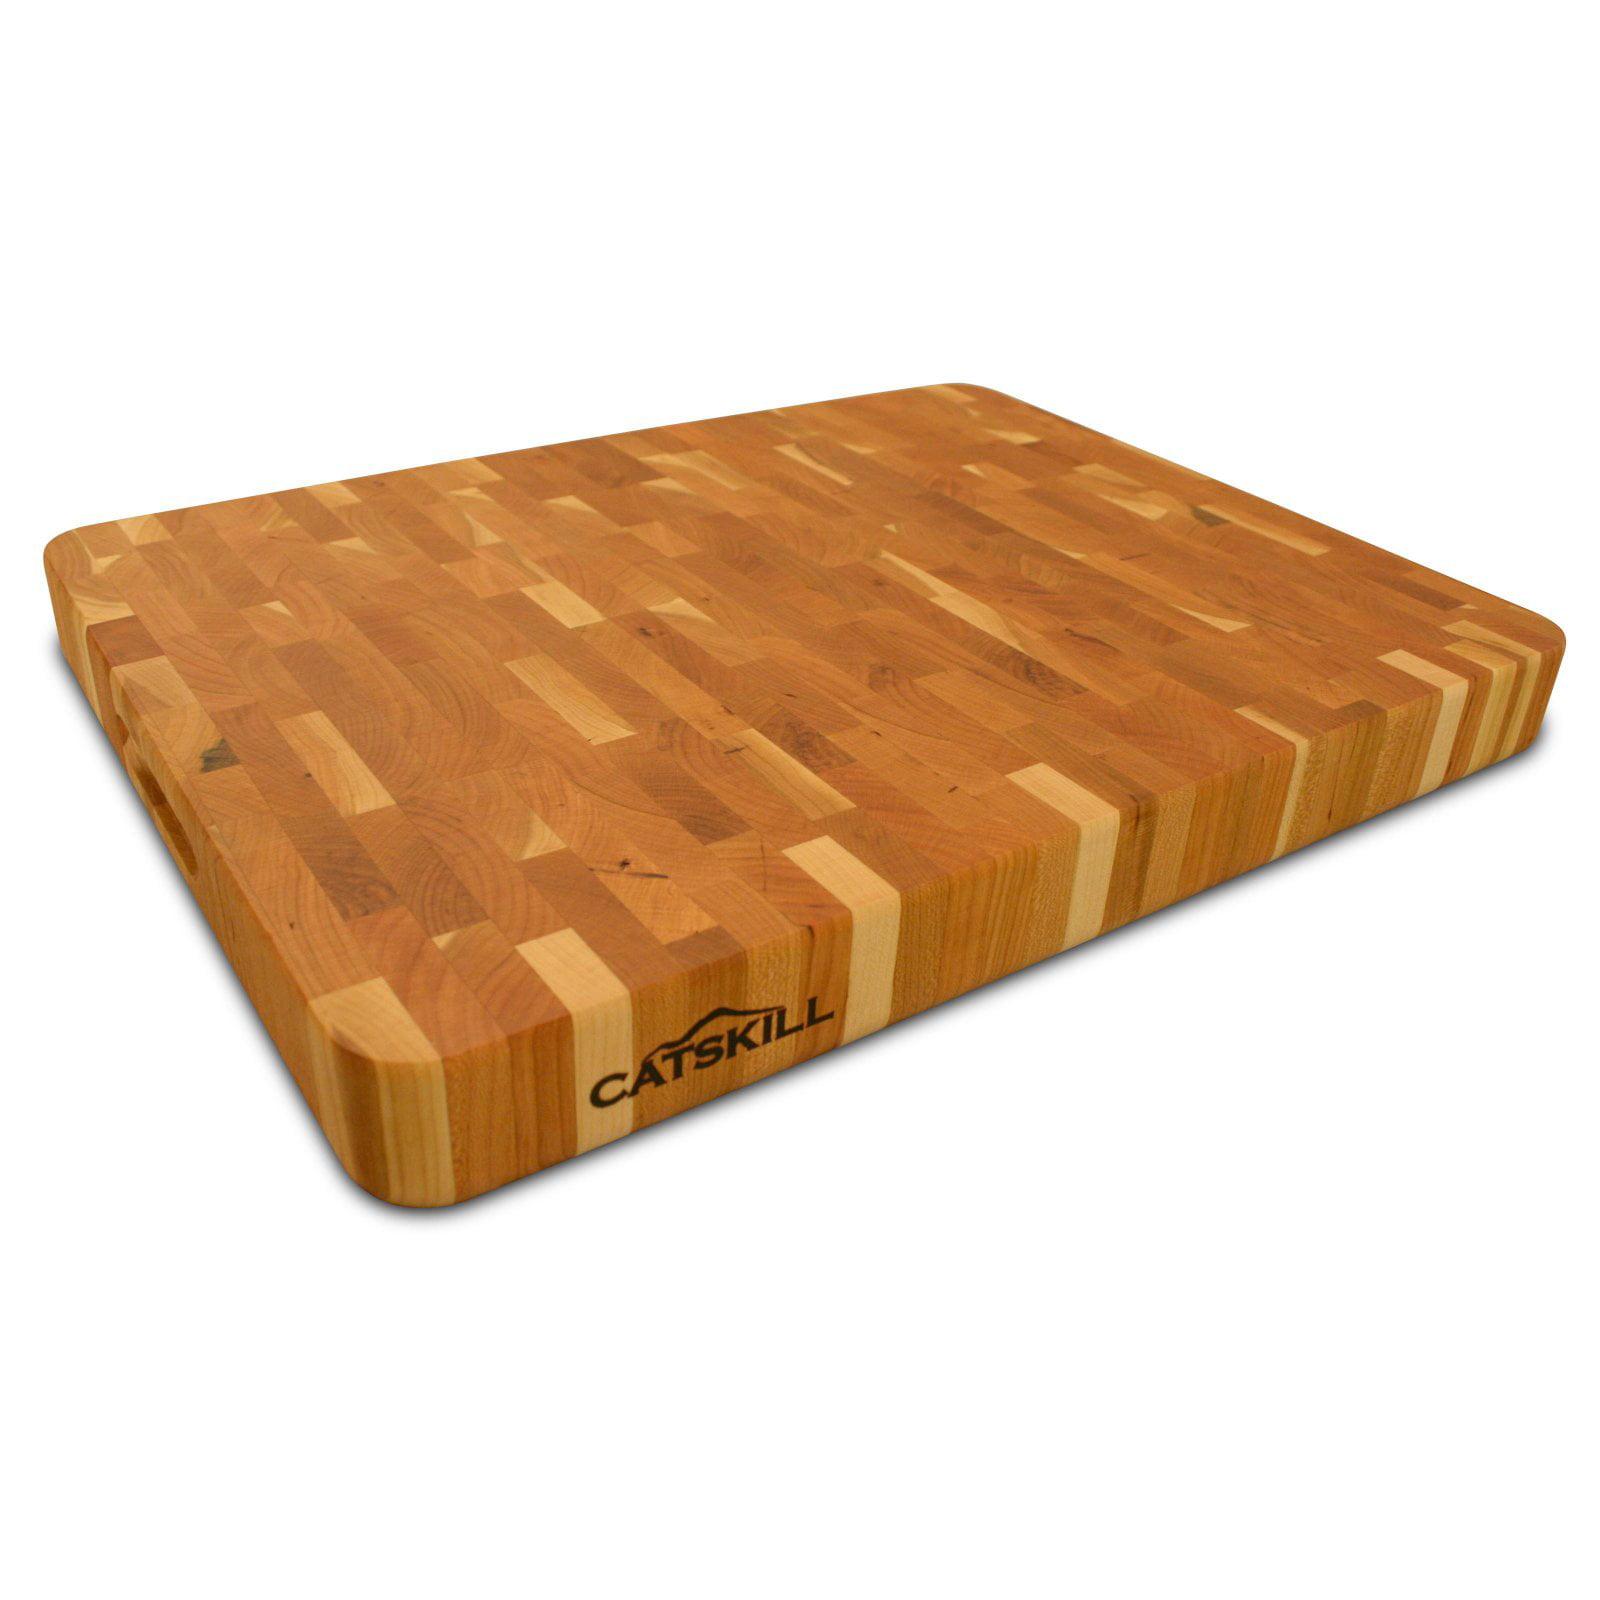 19 x 14.5 Professional End Grain Cutting Board